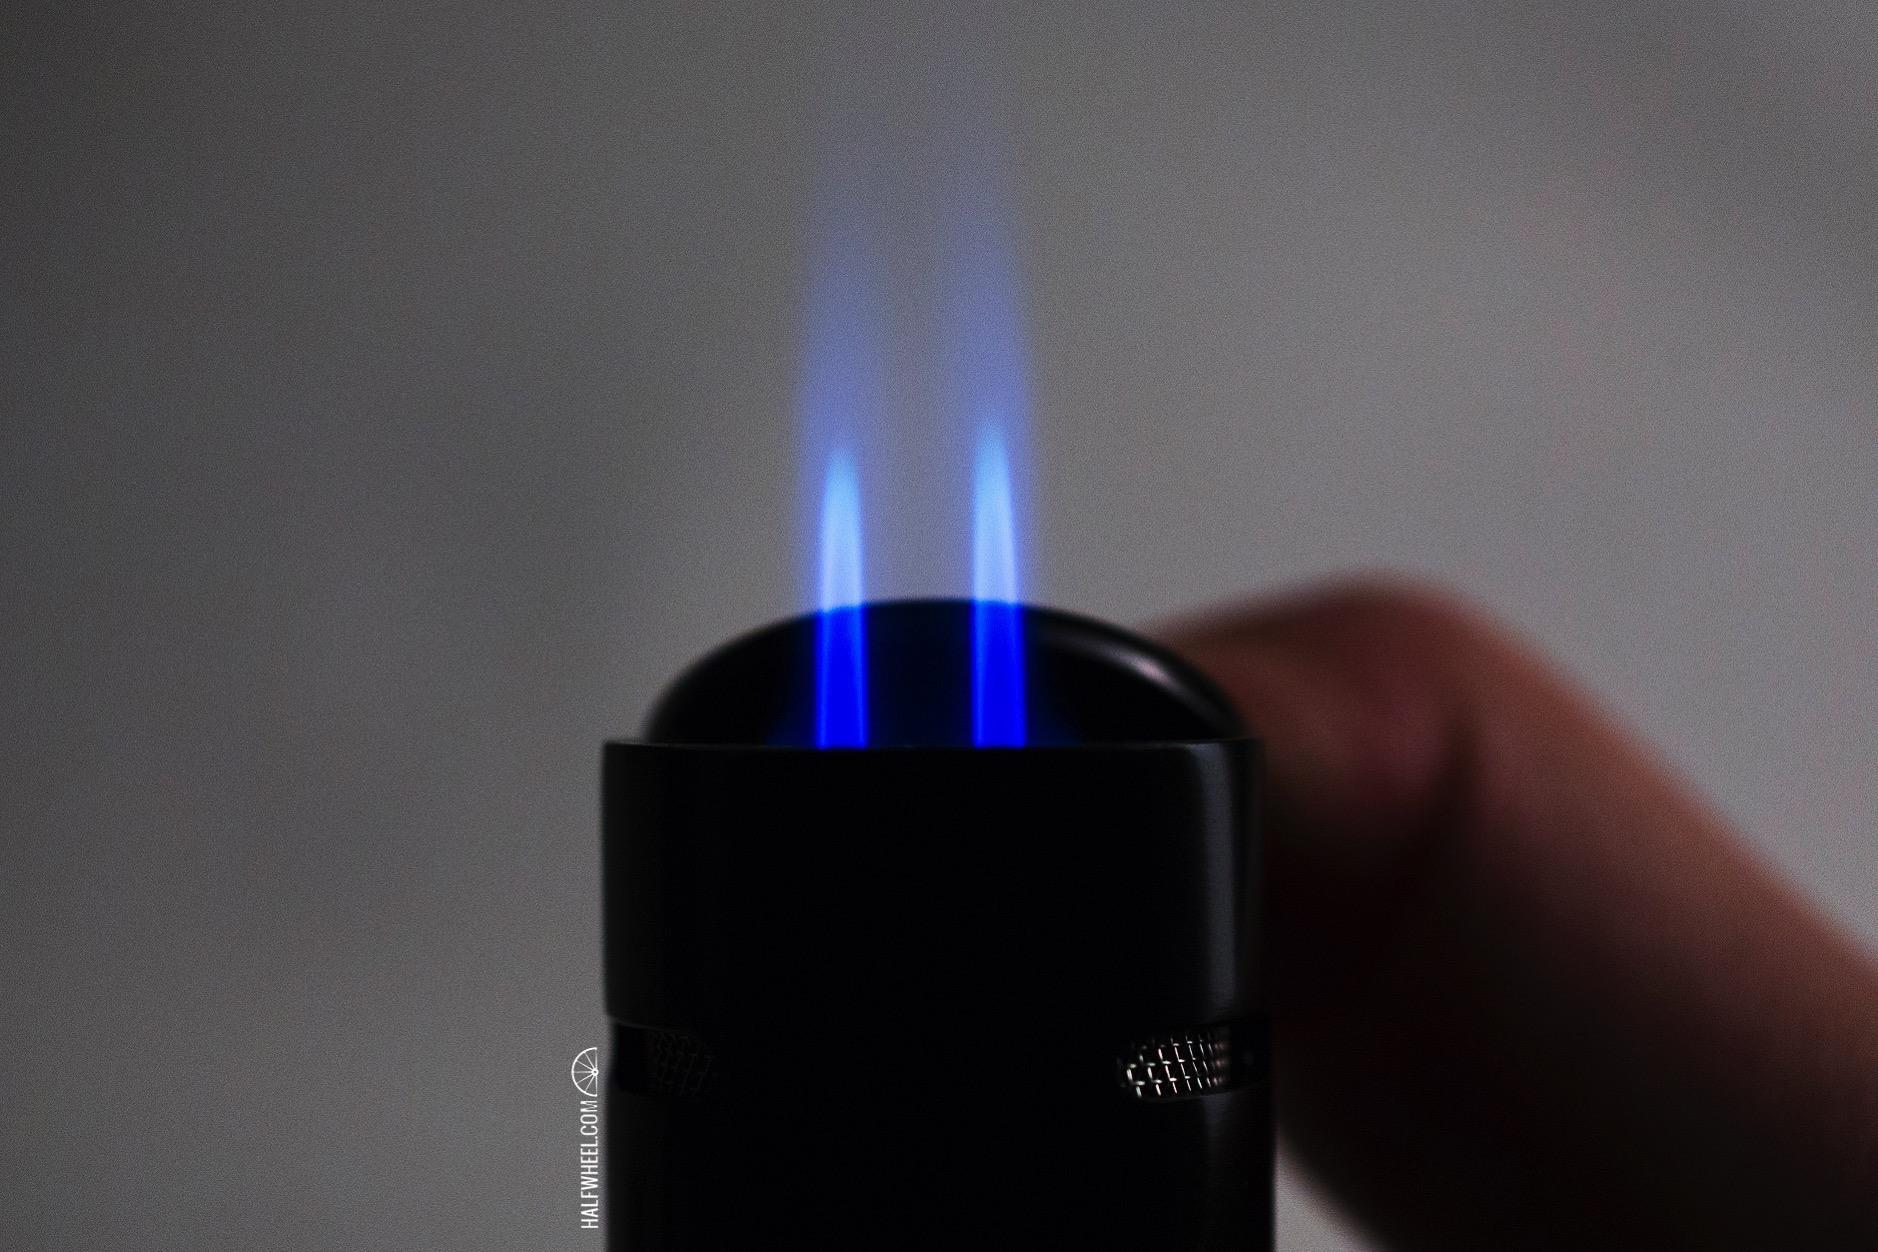 XIKAR 5x64 Turrim flame